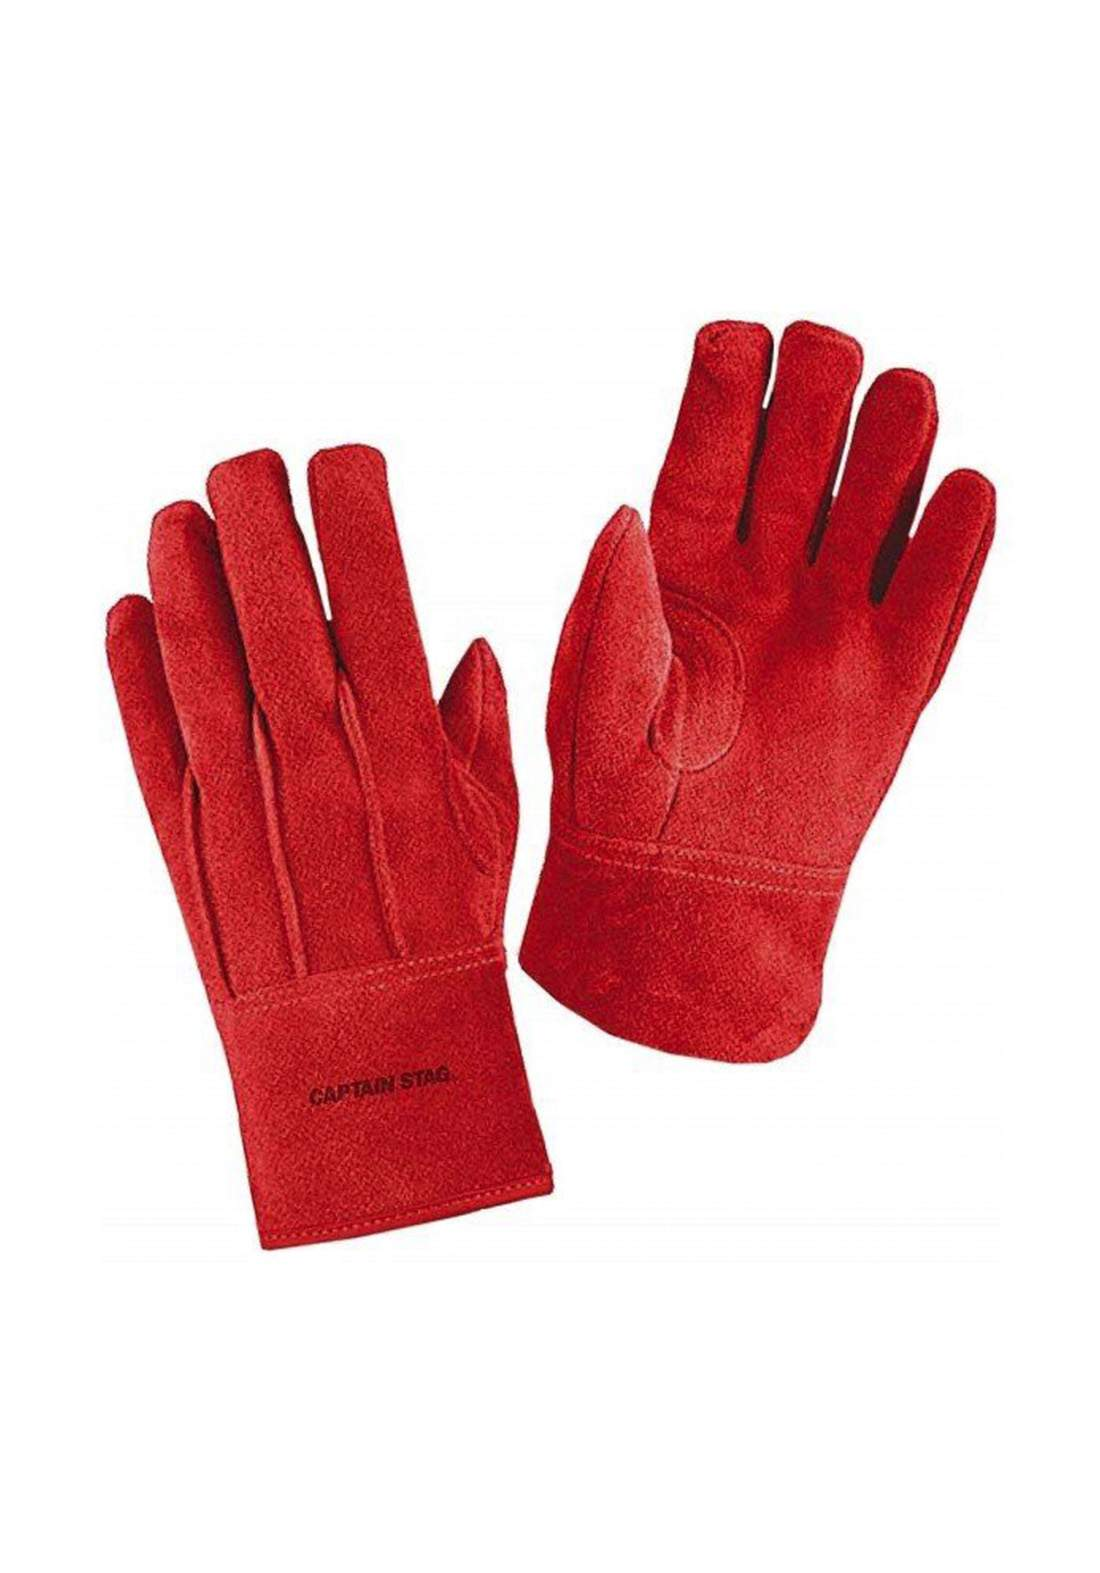 Captain Stag  UM-1909 Outdoor Camping Leather Gloves Heat-Resistant Gloves  قفازات جلدية مقاومة للحرارة